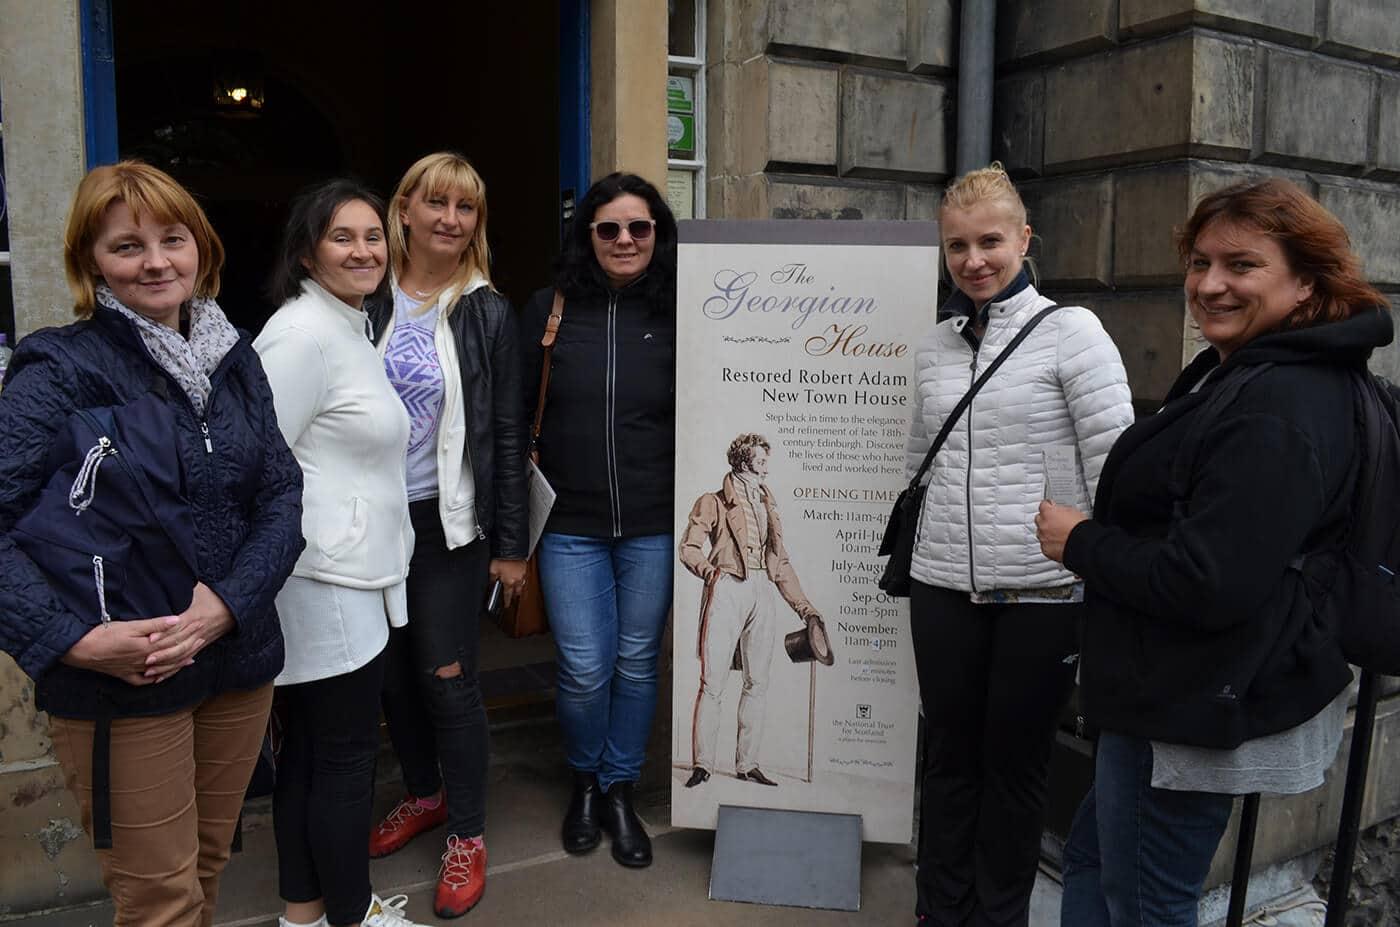 Visit the beautiful Georgian House in Edinburgh